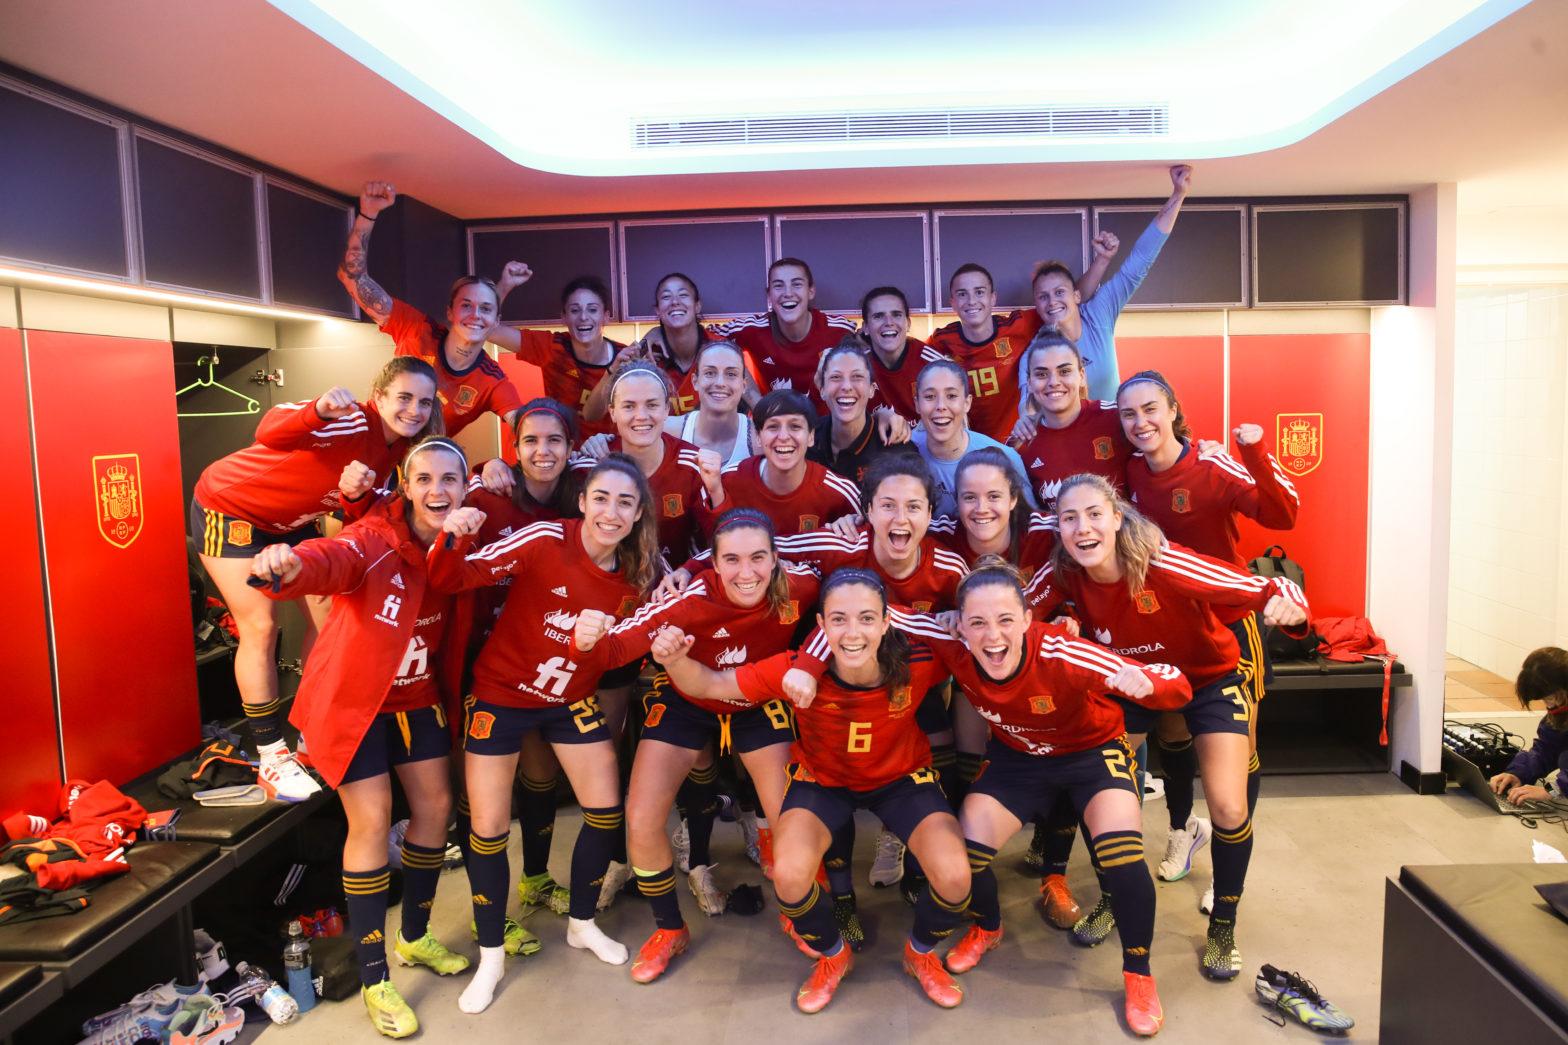 Celebración en vestuario deEspaña vence a toda una campeona de Europa